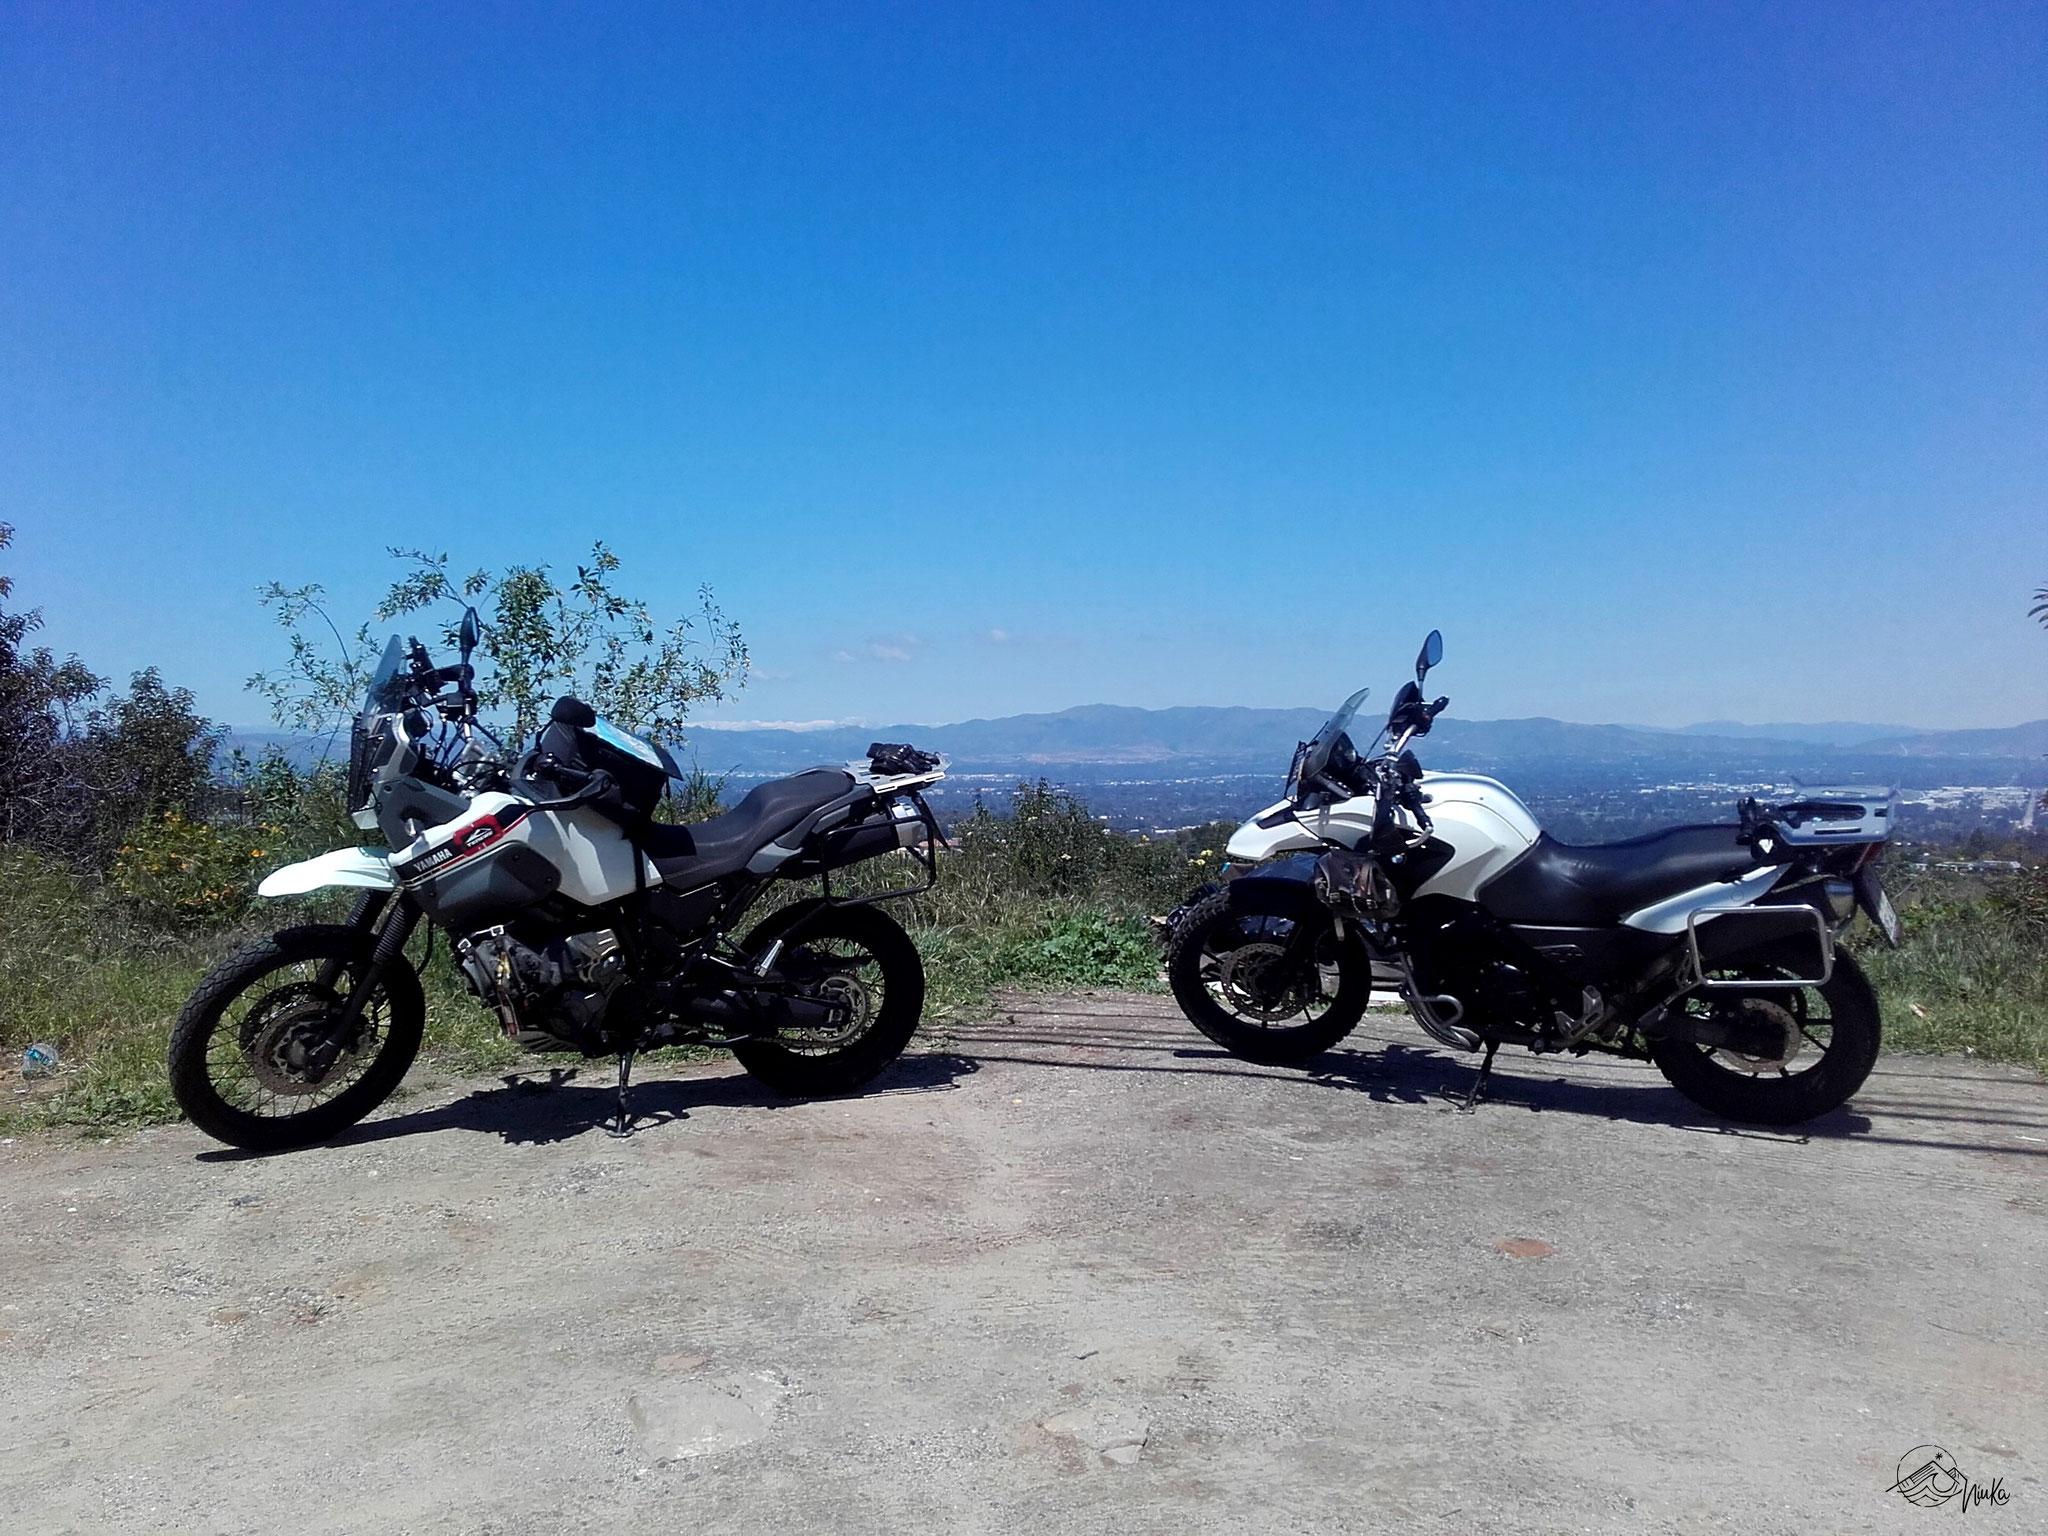 Motorradtour entlang des Mullholland Drive